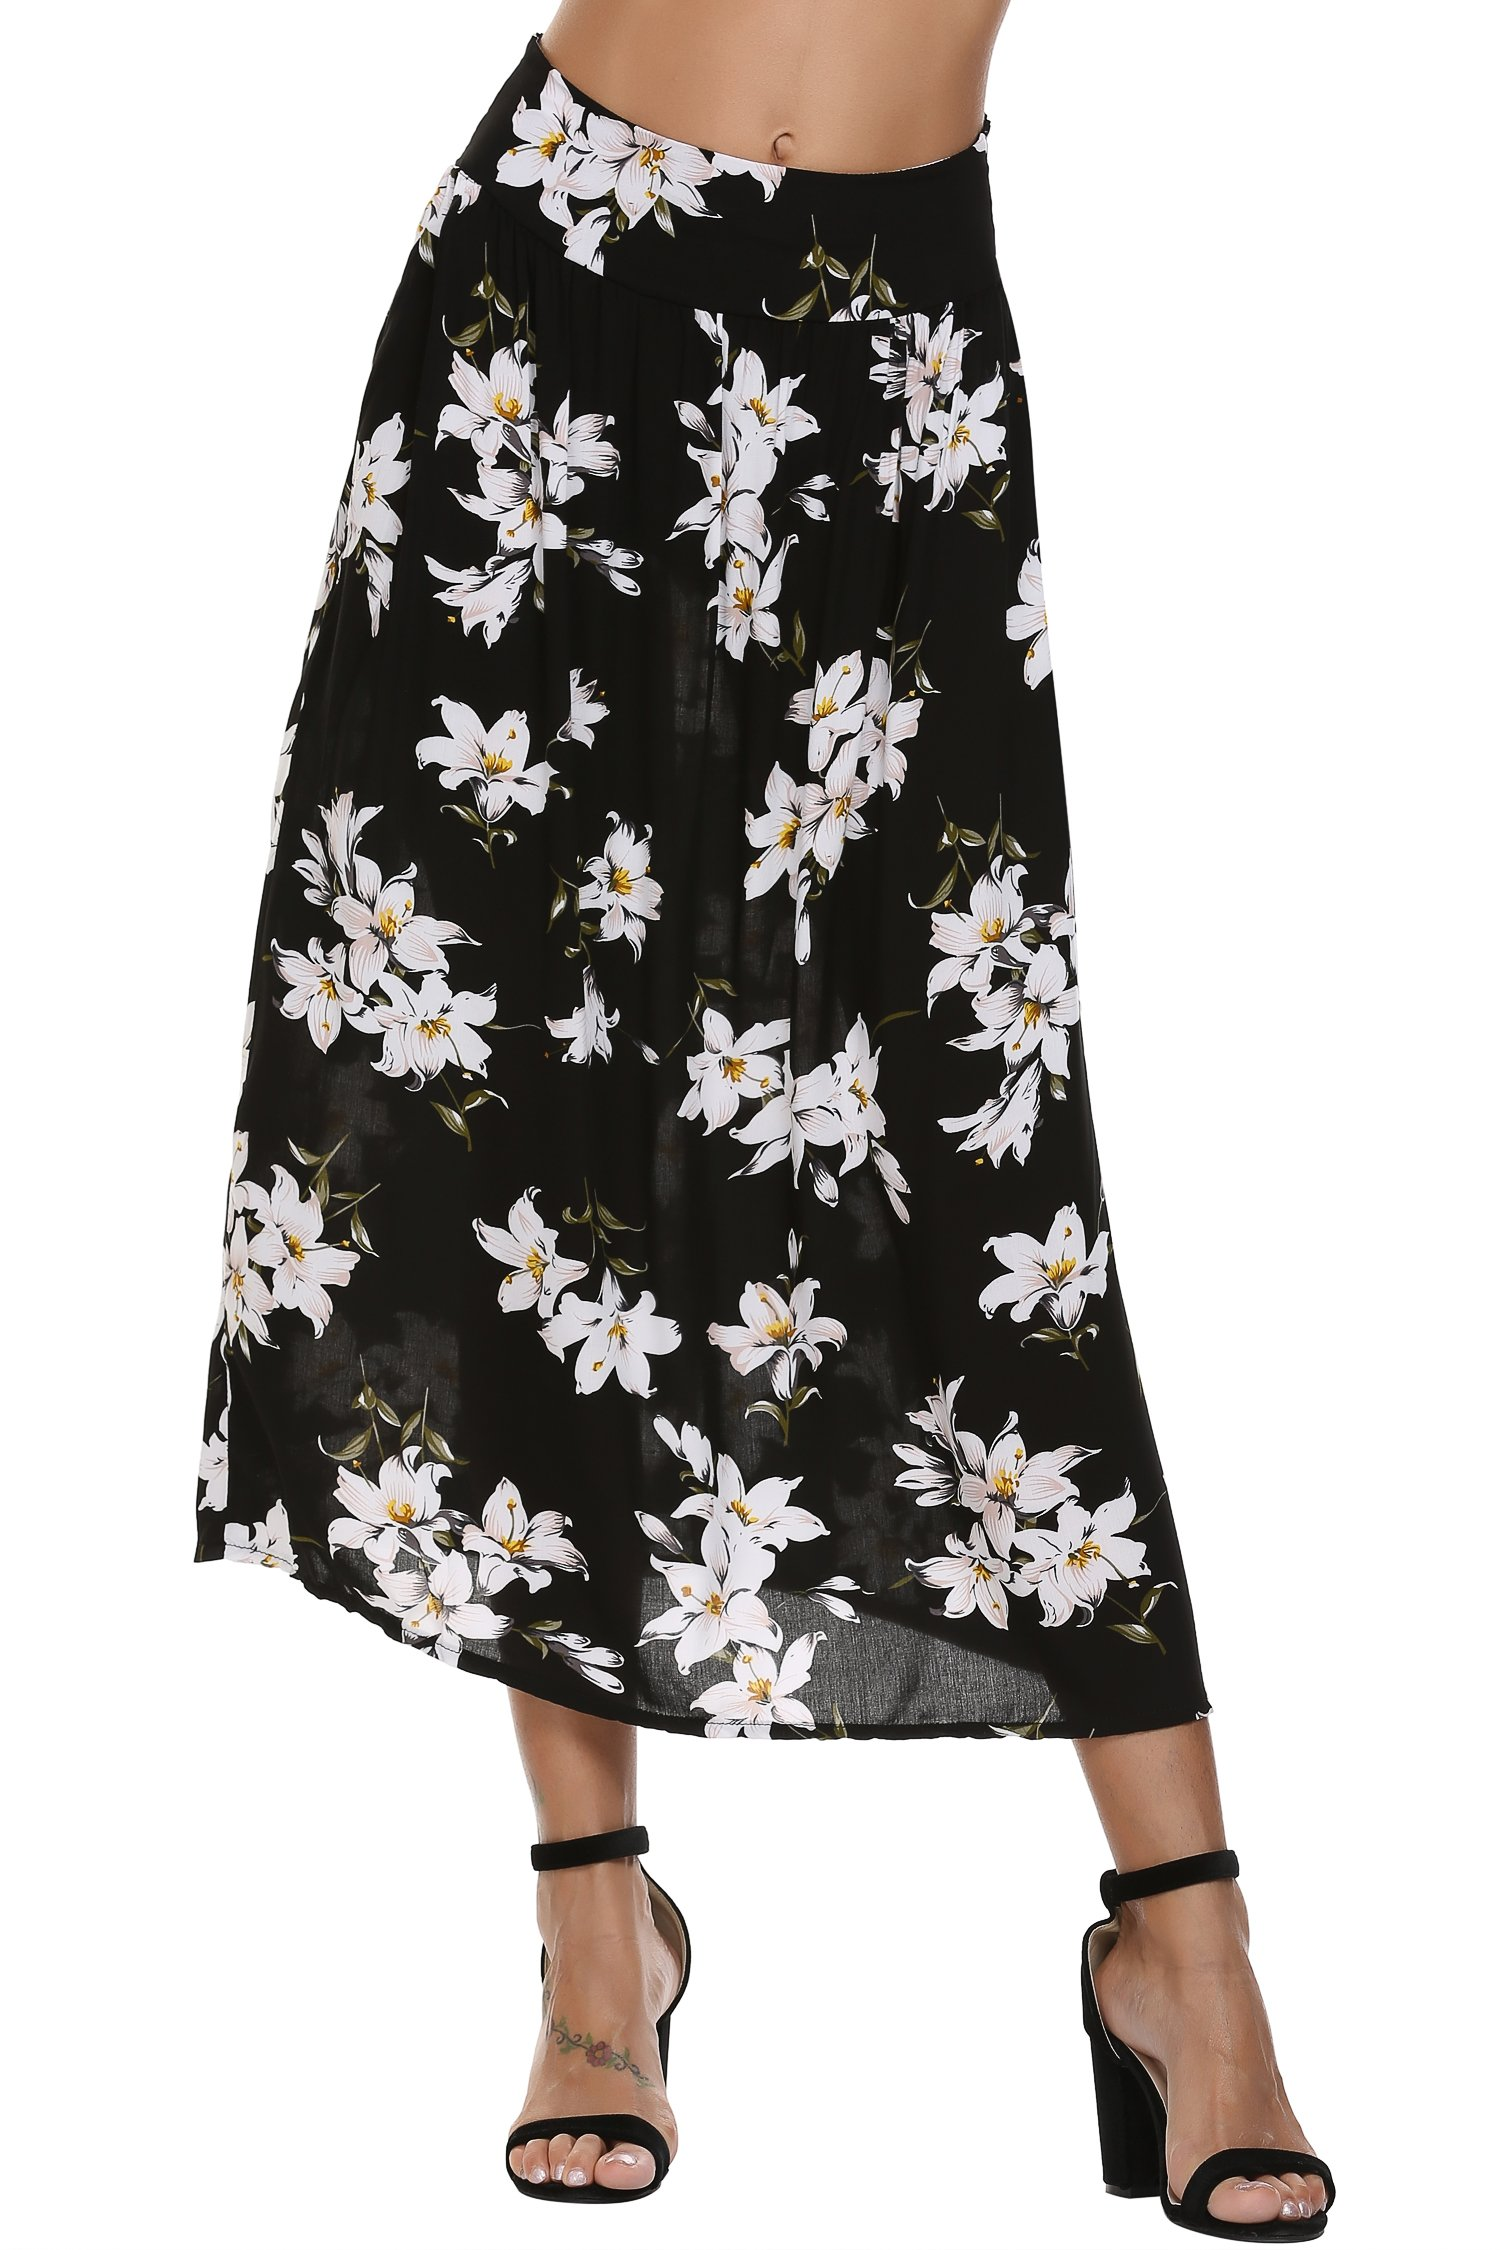 Zeagoo Bohemian Style Elastic Waist Band Cotton Long Maxi Skirt Dress